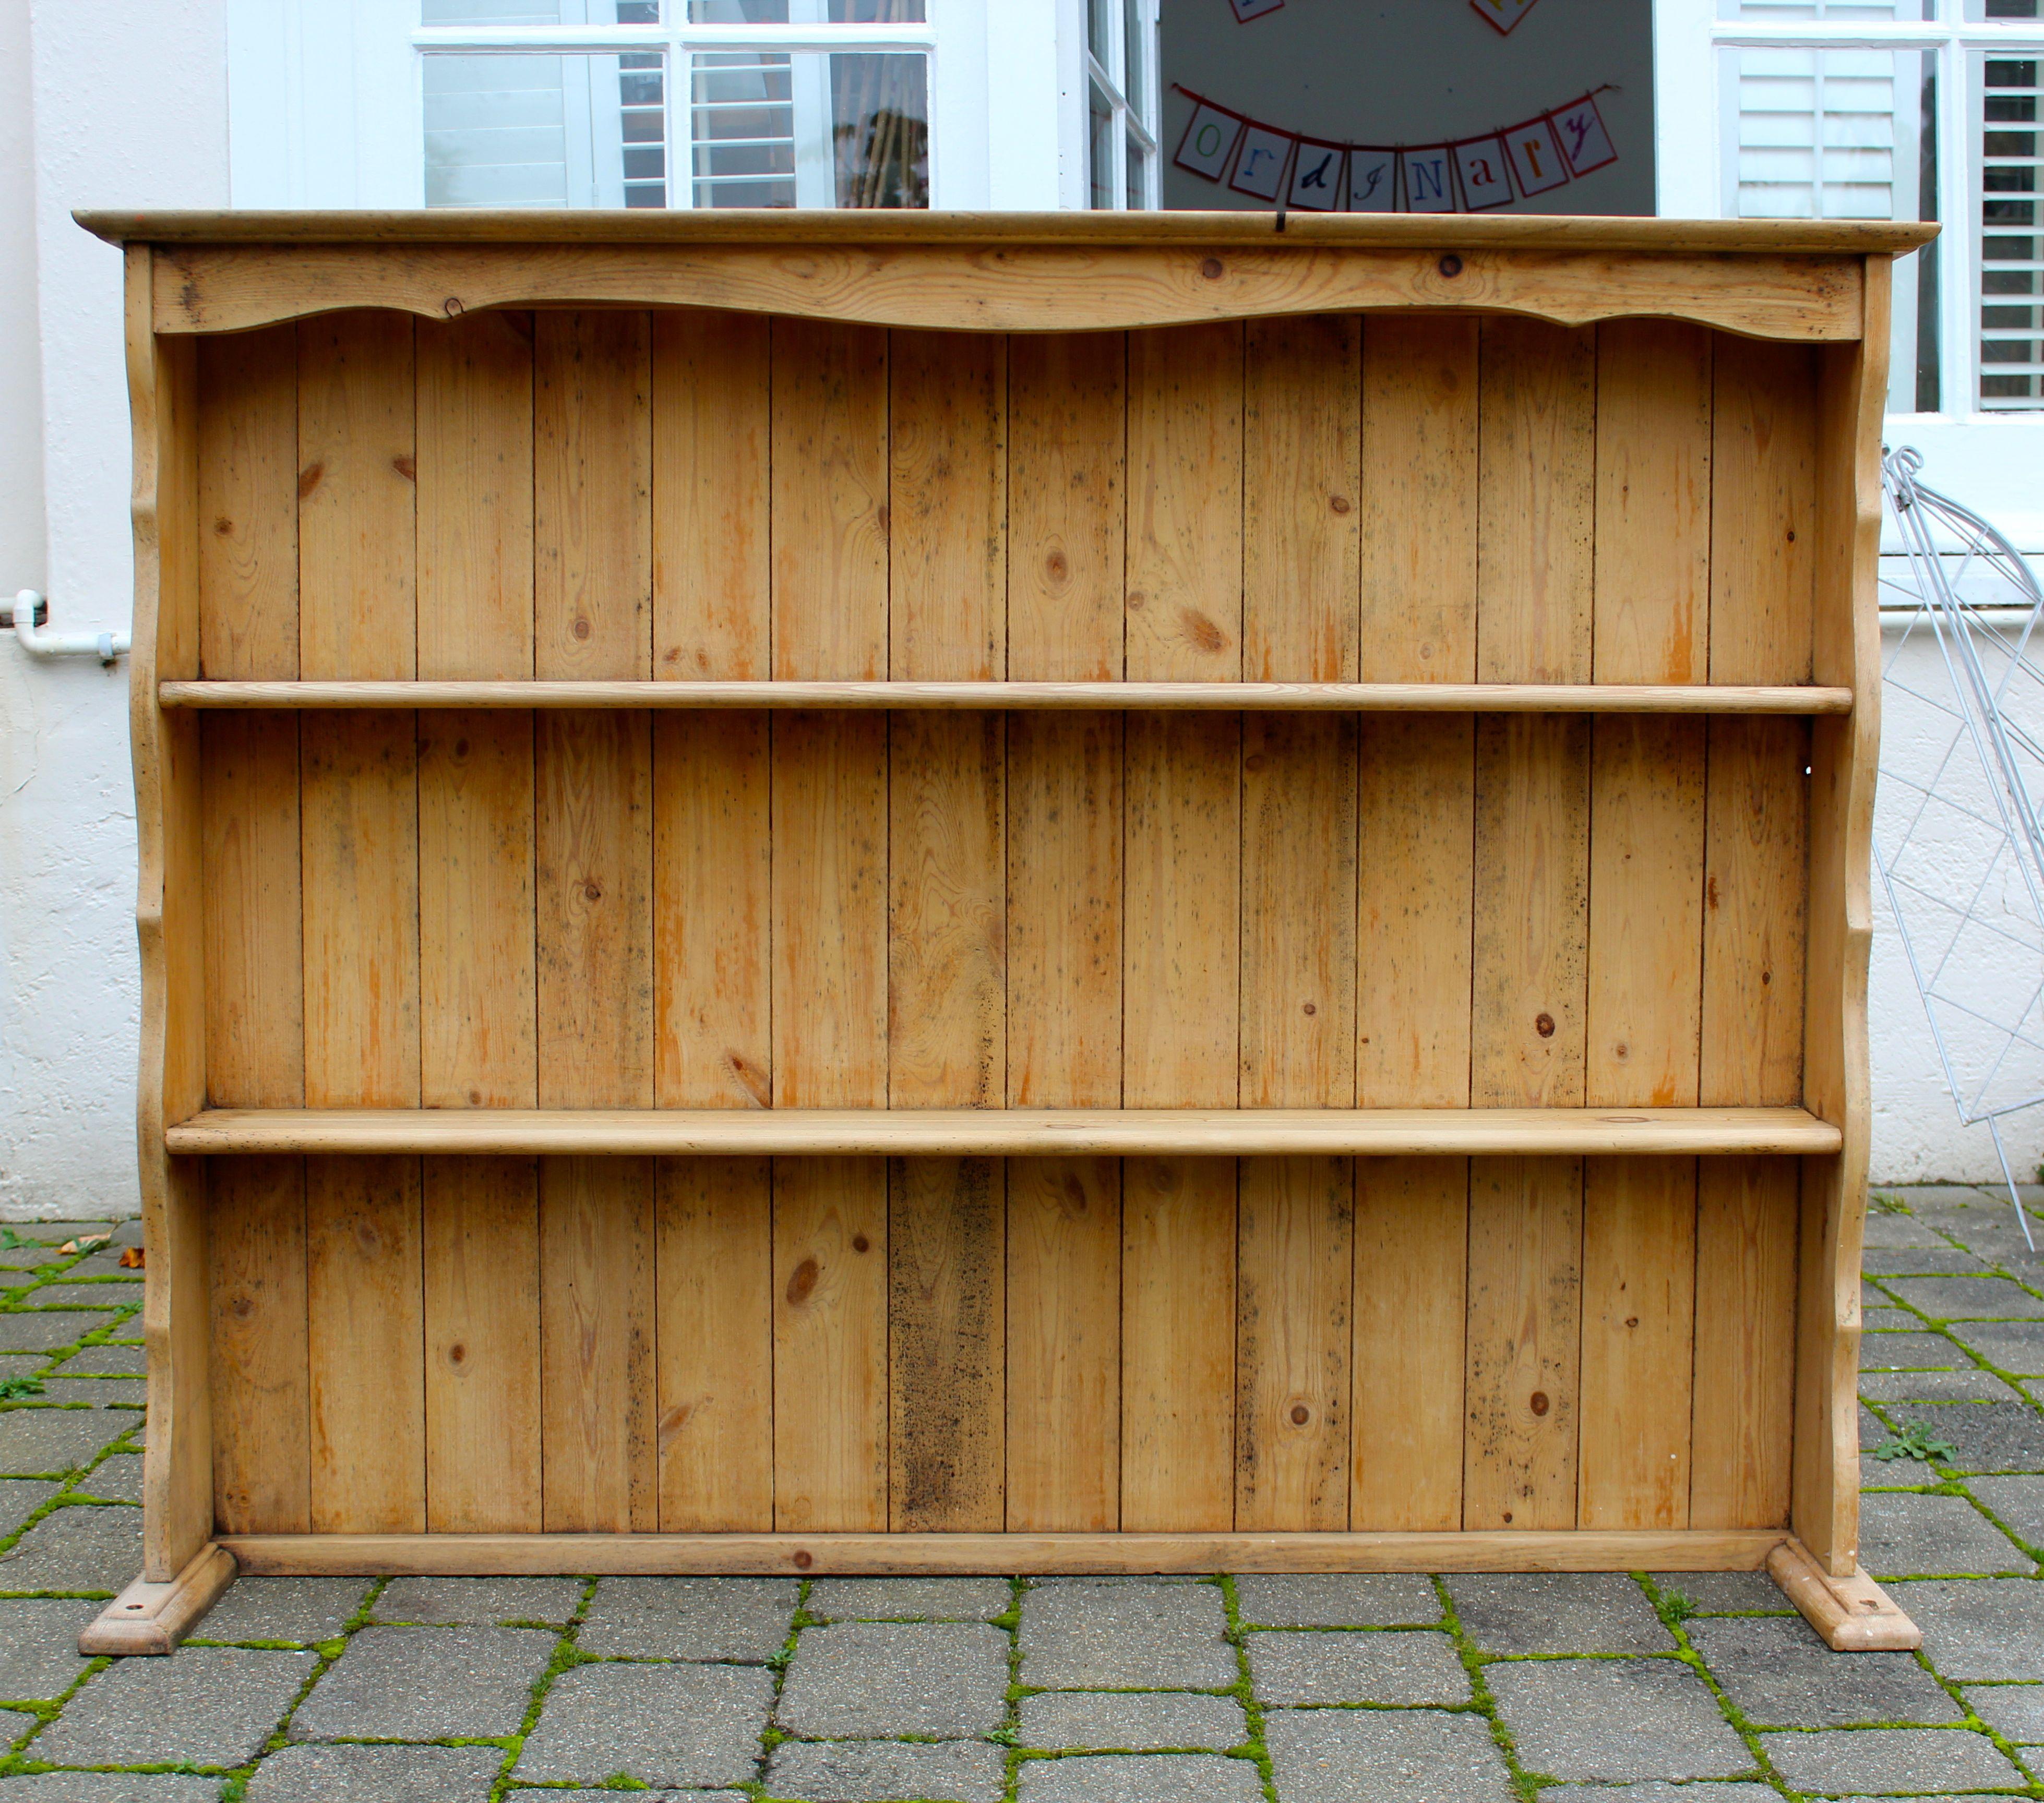 Boat Shaped Bookshelf Plans Pdf Download Free Woodworking